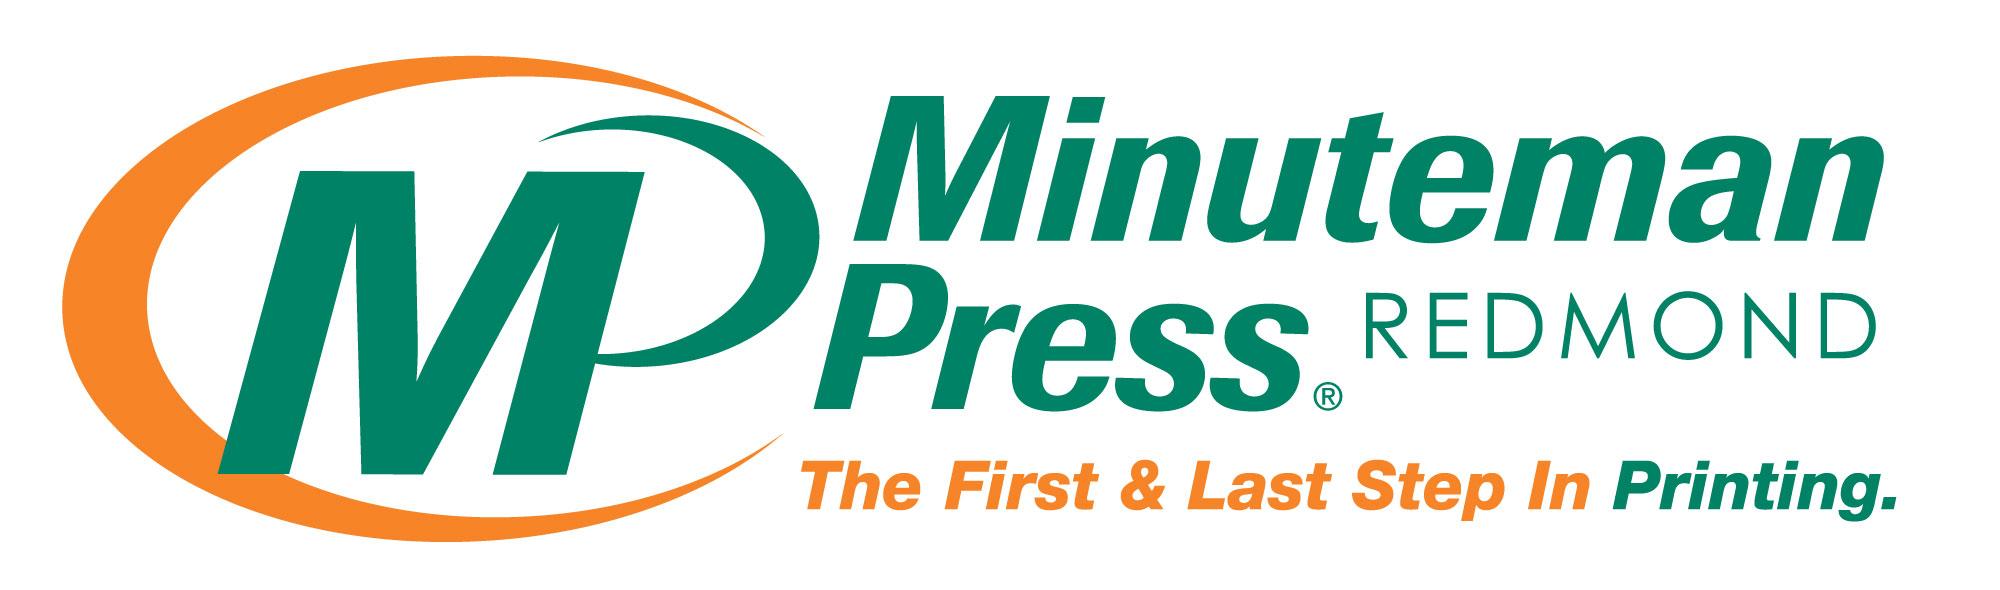 logo_minuteman_press